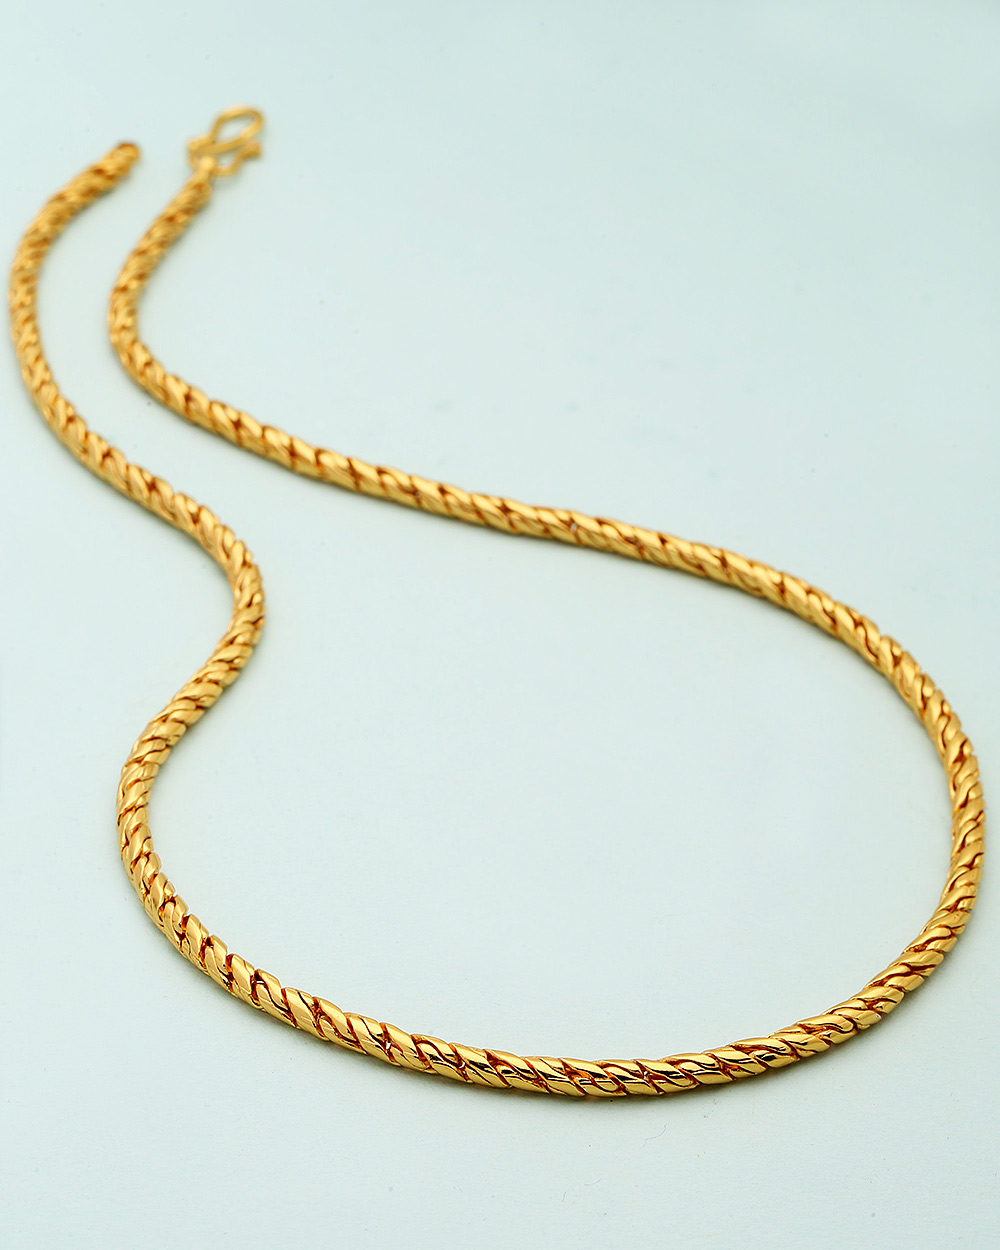 Buy Snake Designer Sleek Yellow Gold Chain Online India | Voylla